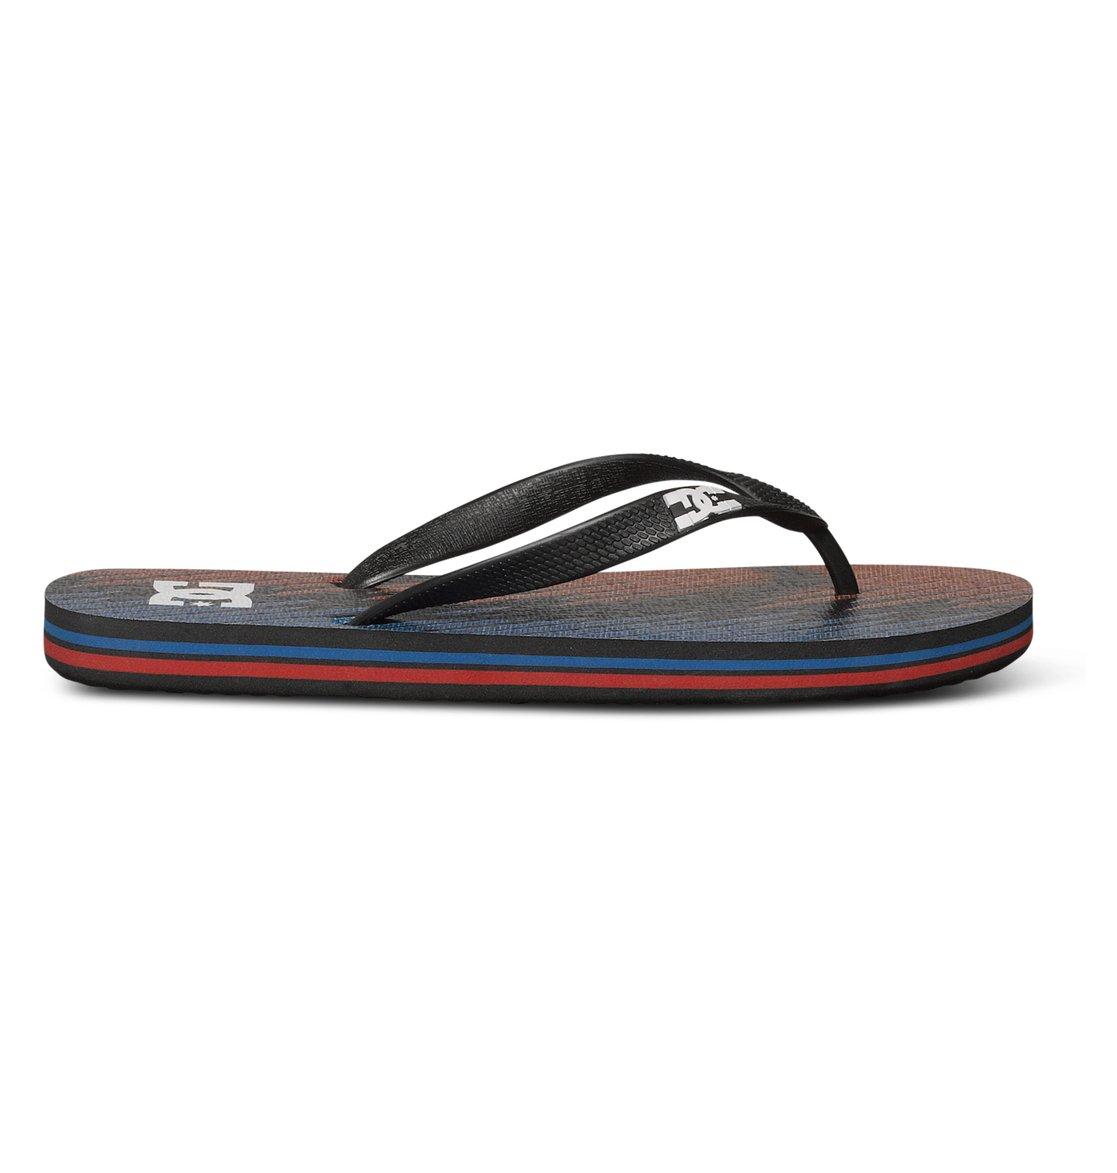 1a1416f1bfe7c 1 Spray Graffik Flip flops 303276 DC Shoes